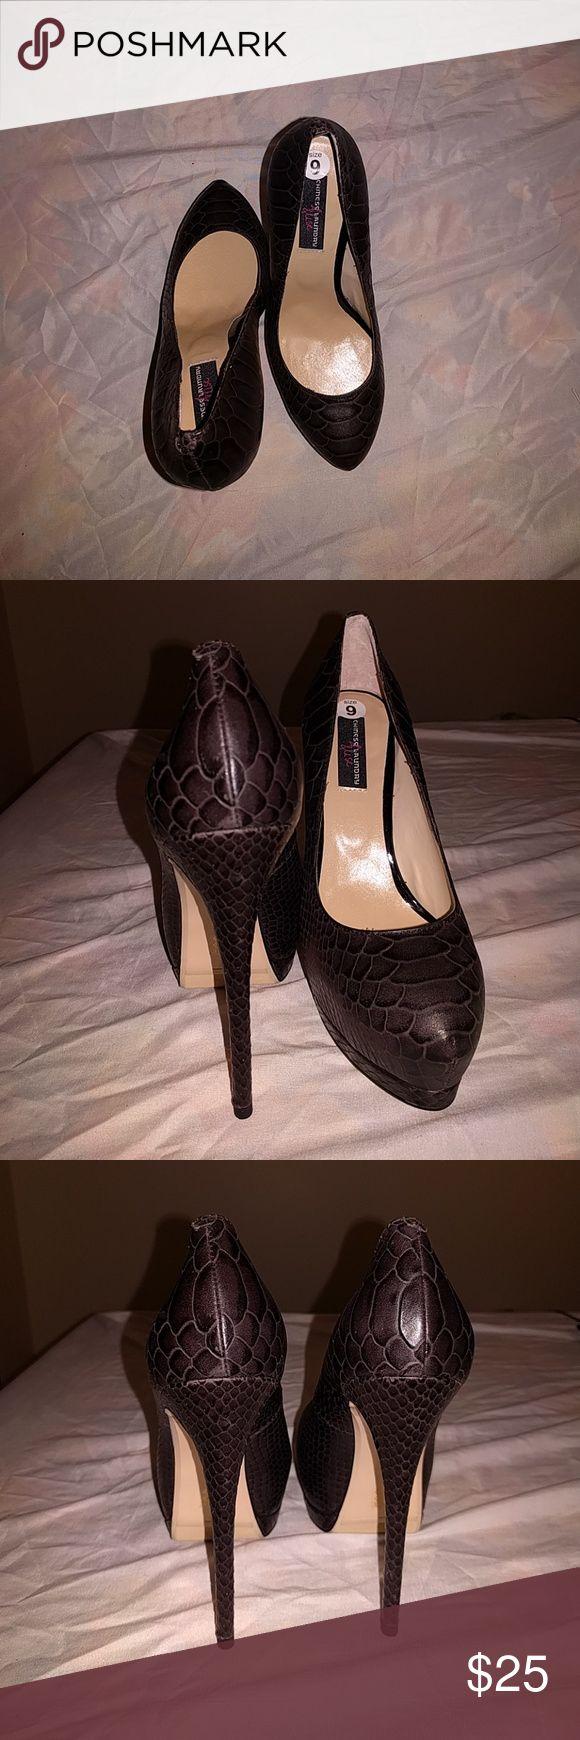 "NWOT Chinese Laundry 6"" heels NWOT Chinese Laundry 6"" heels Chinese Laundry Shoes Heels"